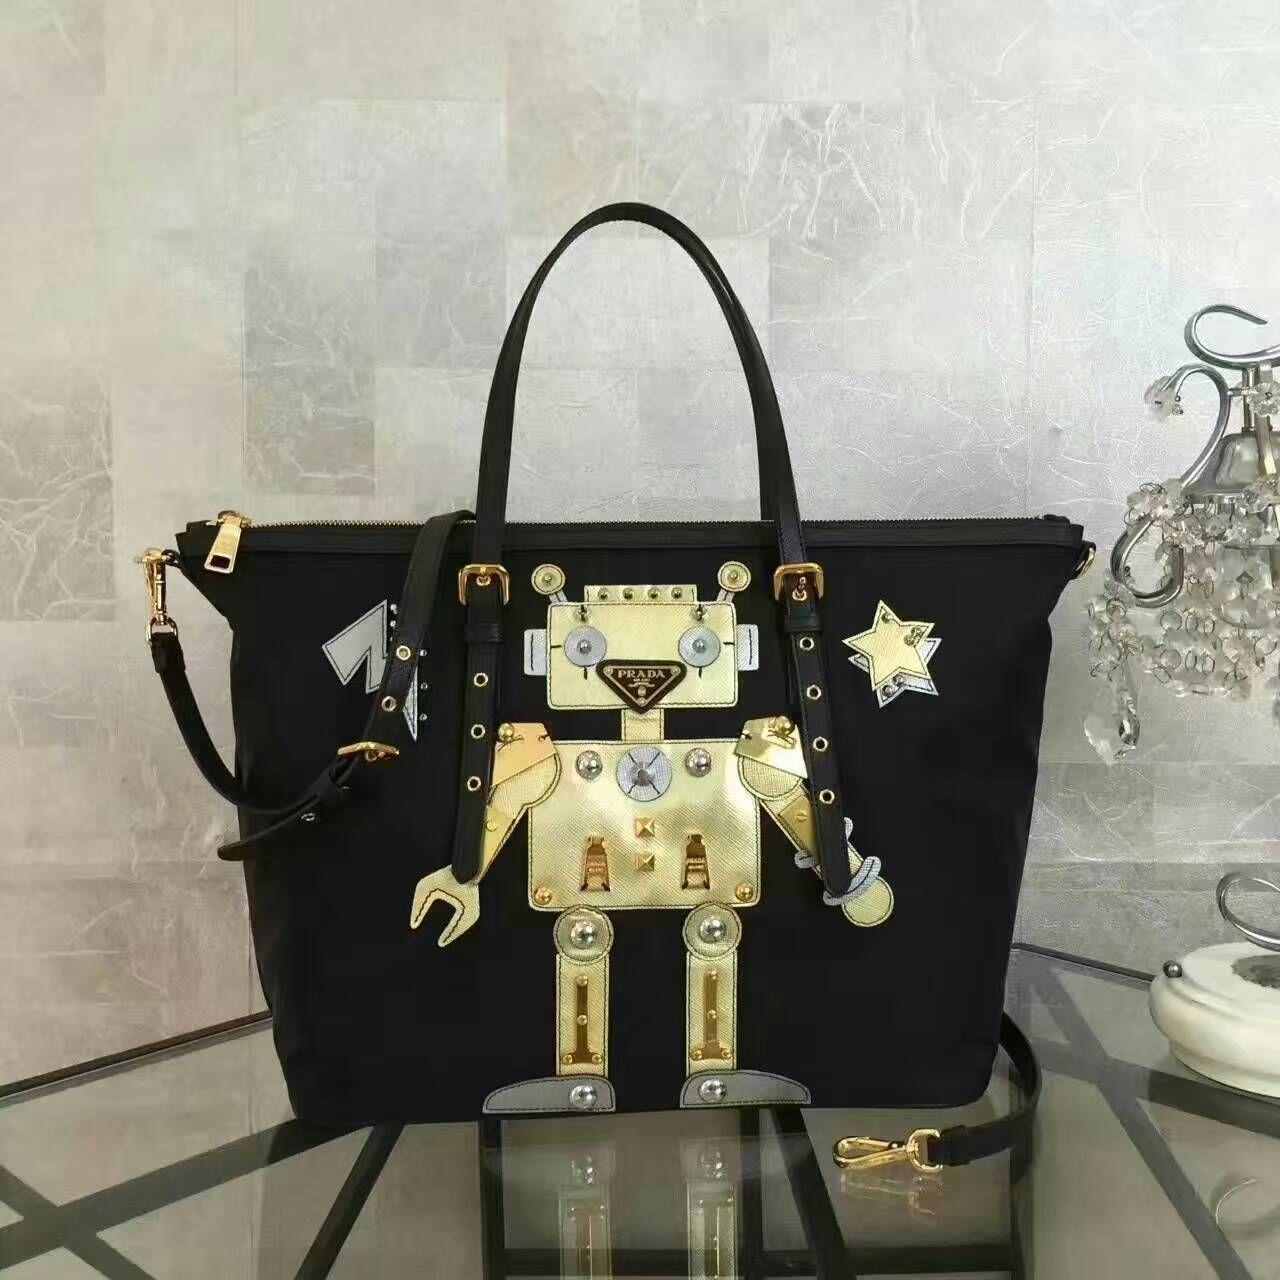 8b2286af2c4 Prada Fabric Tote with Robot Motif Leather and Metal Appliqués 06 ...